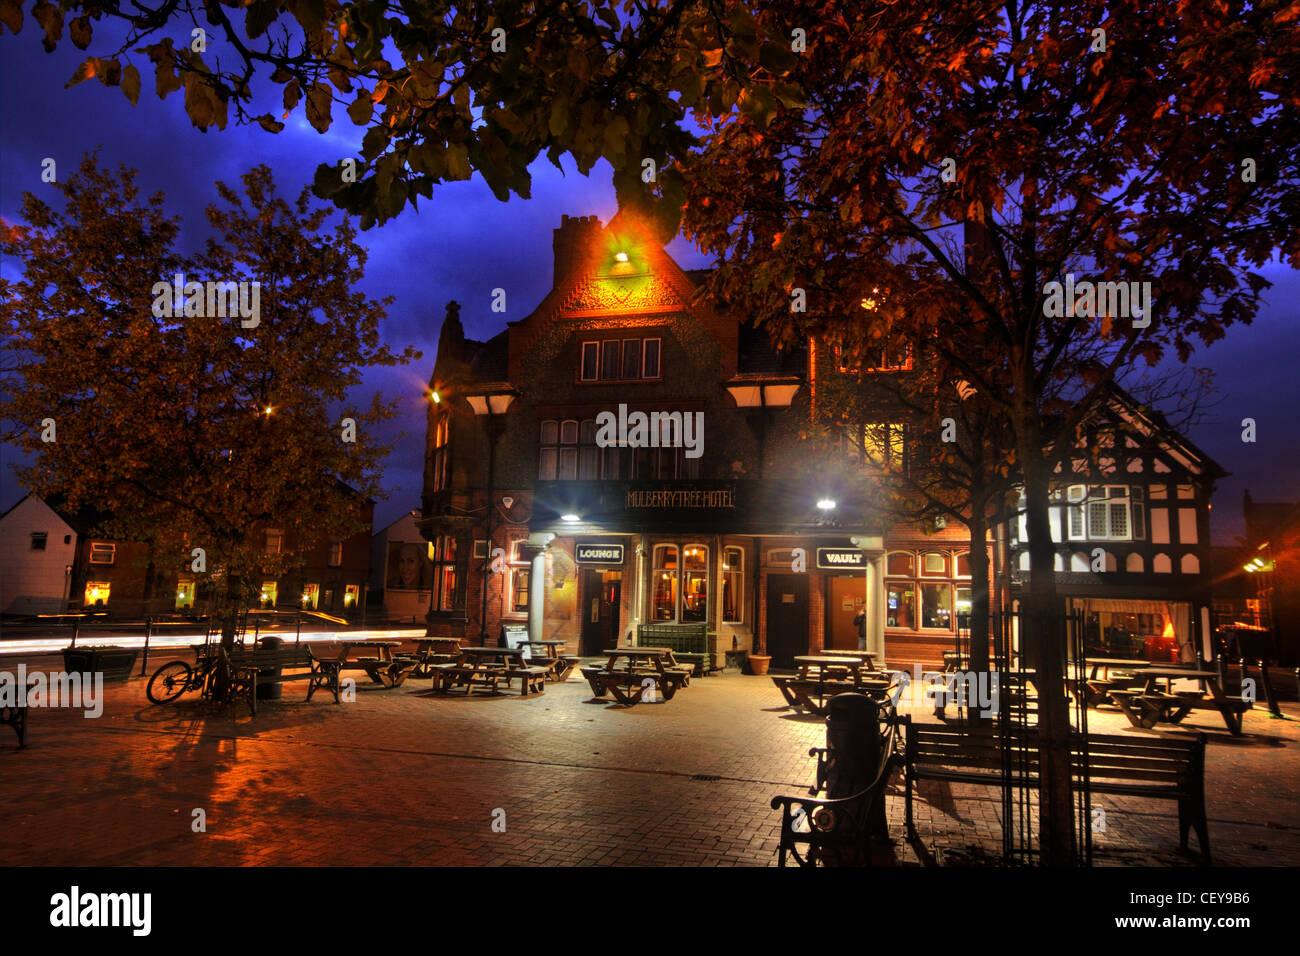 The Mulberry Tree Pub Stockton Heath, South Warrington, Cheshire UK at dusk Stock Photo